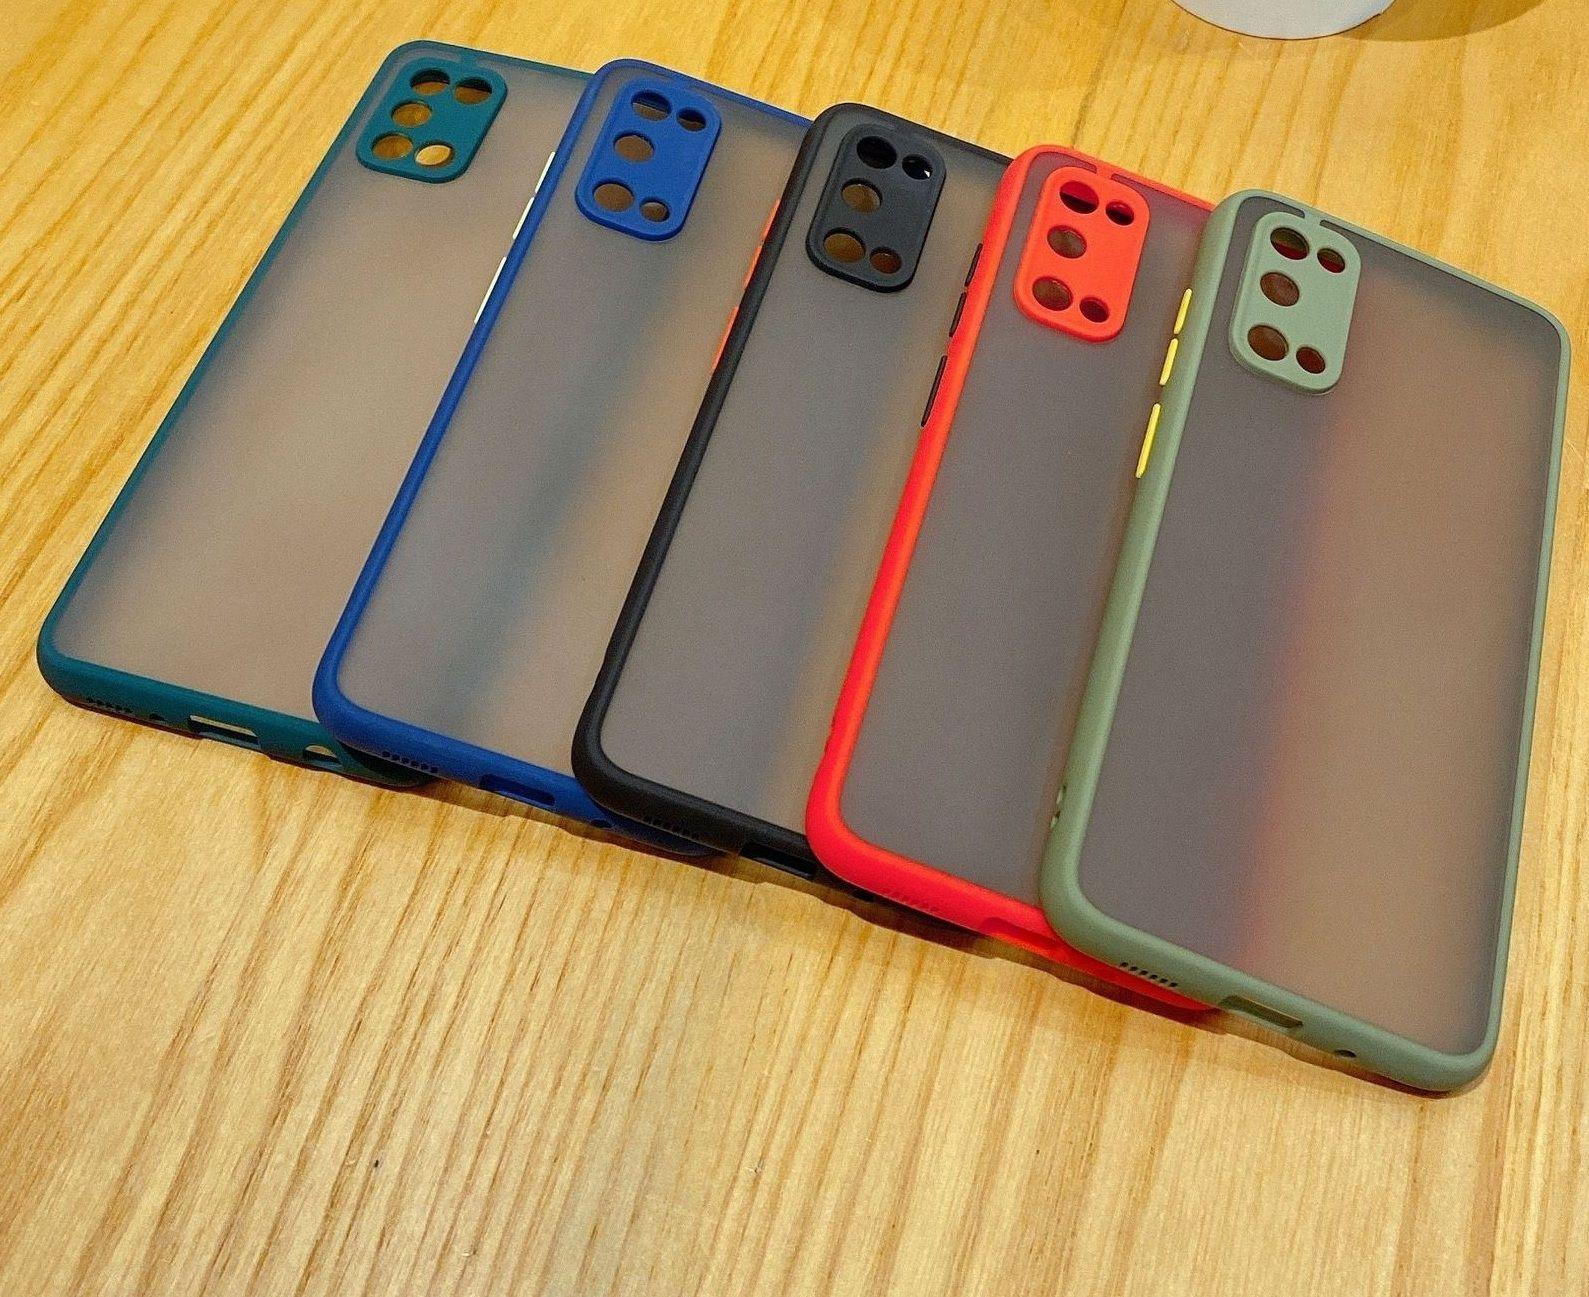 Pelle sensazione di protezione degli occhi Hybrid TPU + PC Casi opaco Cover per Samsung Galaxy M31 M51 M30S M31S Nota 20 Ultra 100pcs / lot